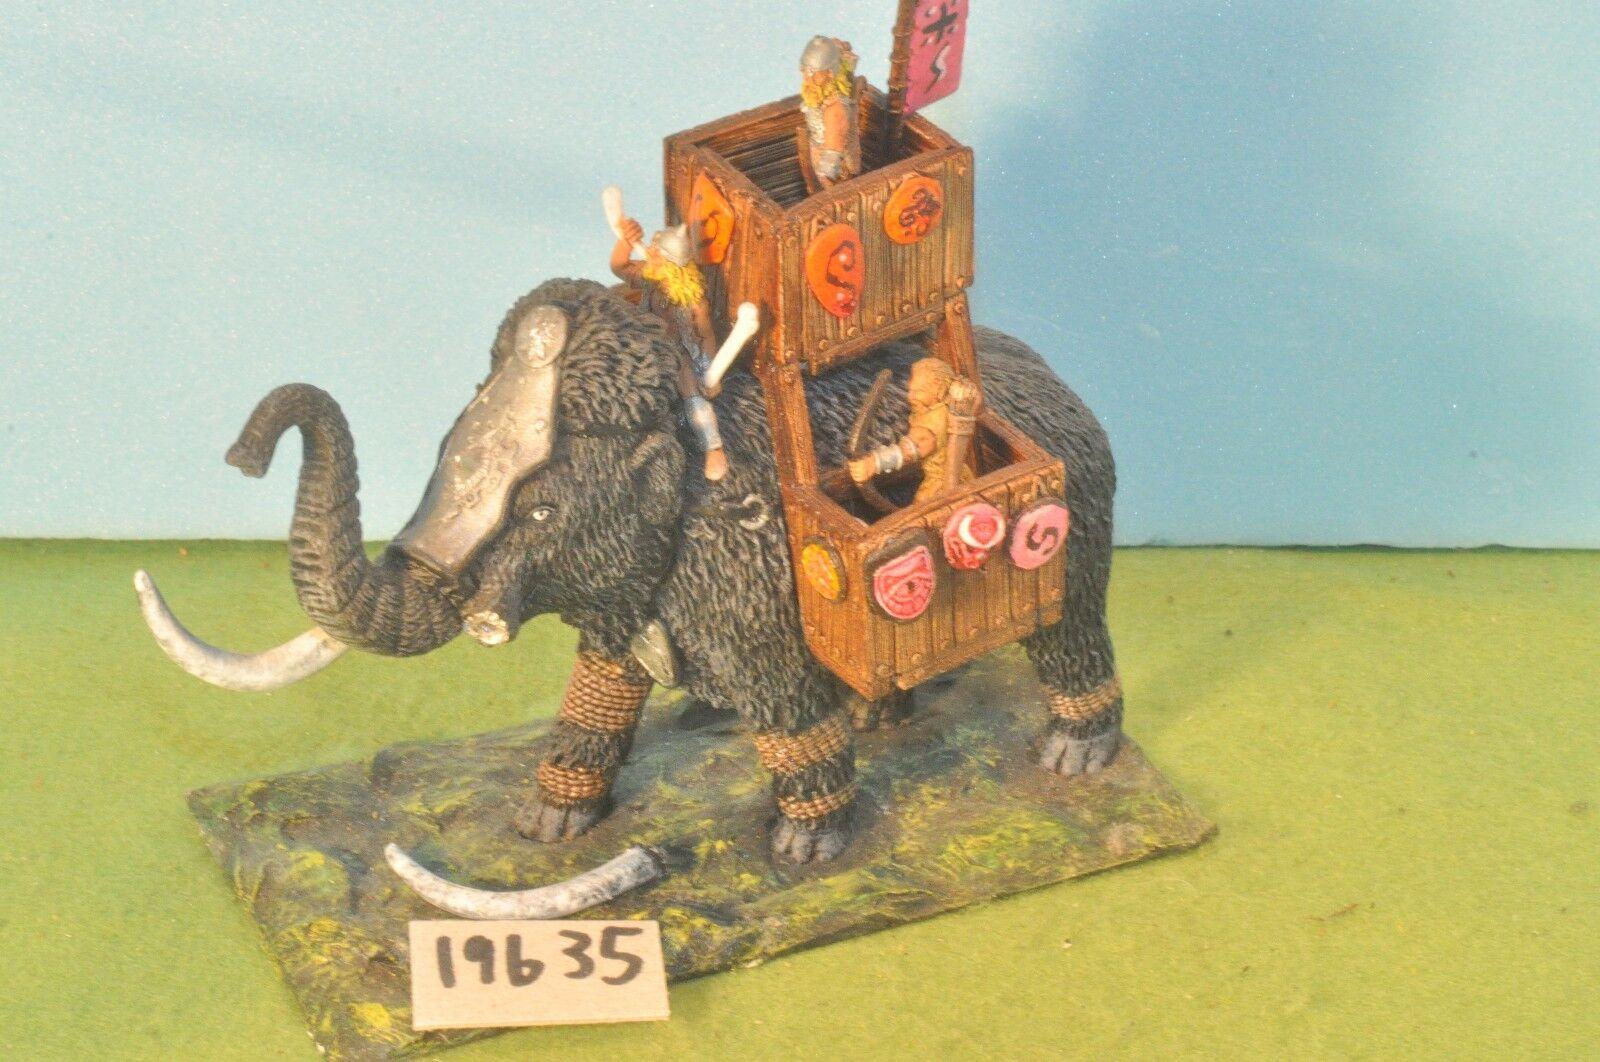 Guerra de metal elefante mamut Sigmar Fantasía Warhammer Ral Partha Ciudadela (20183)